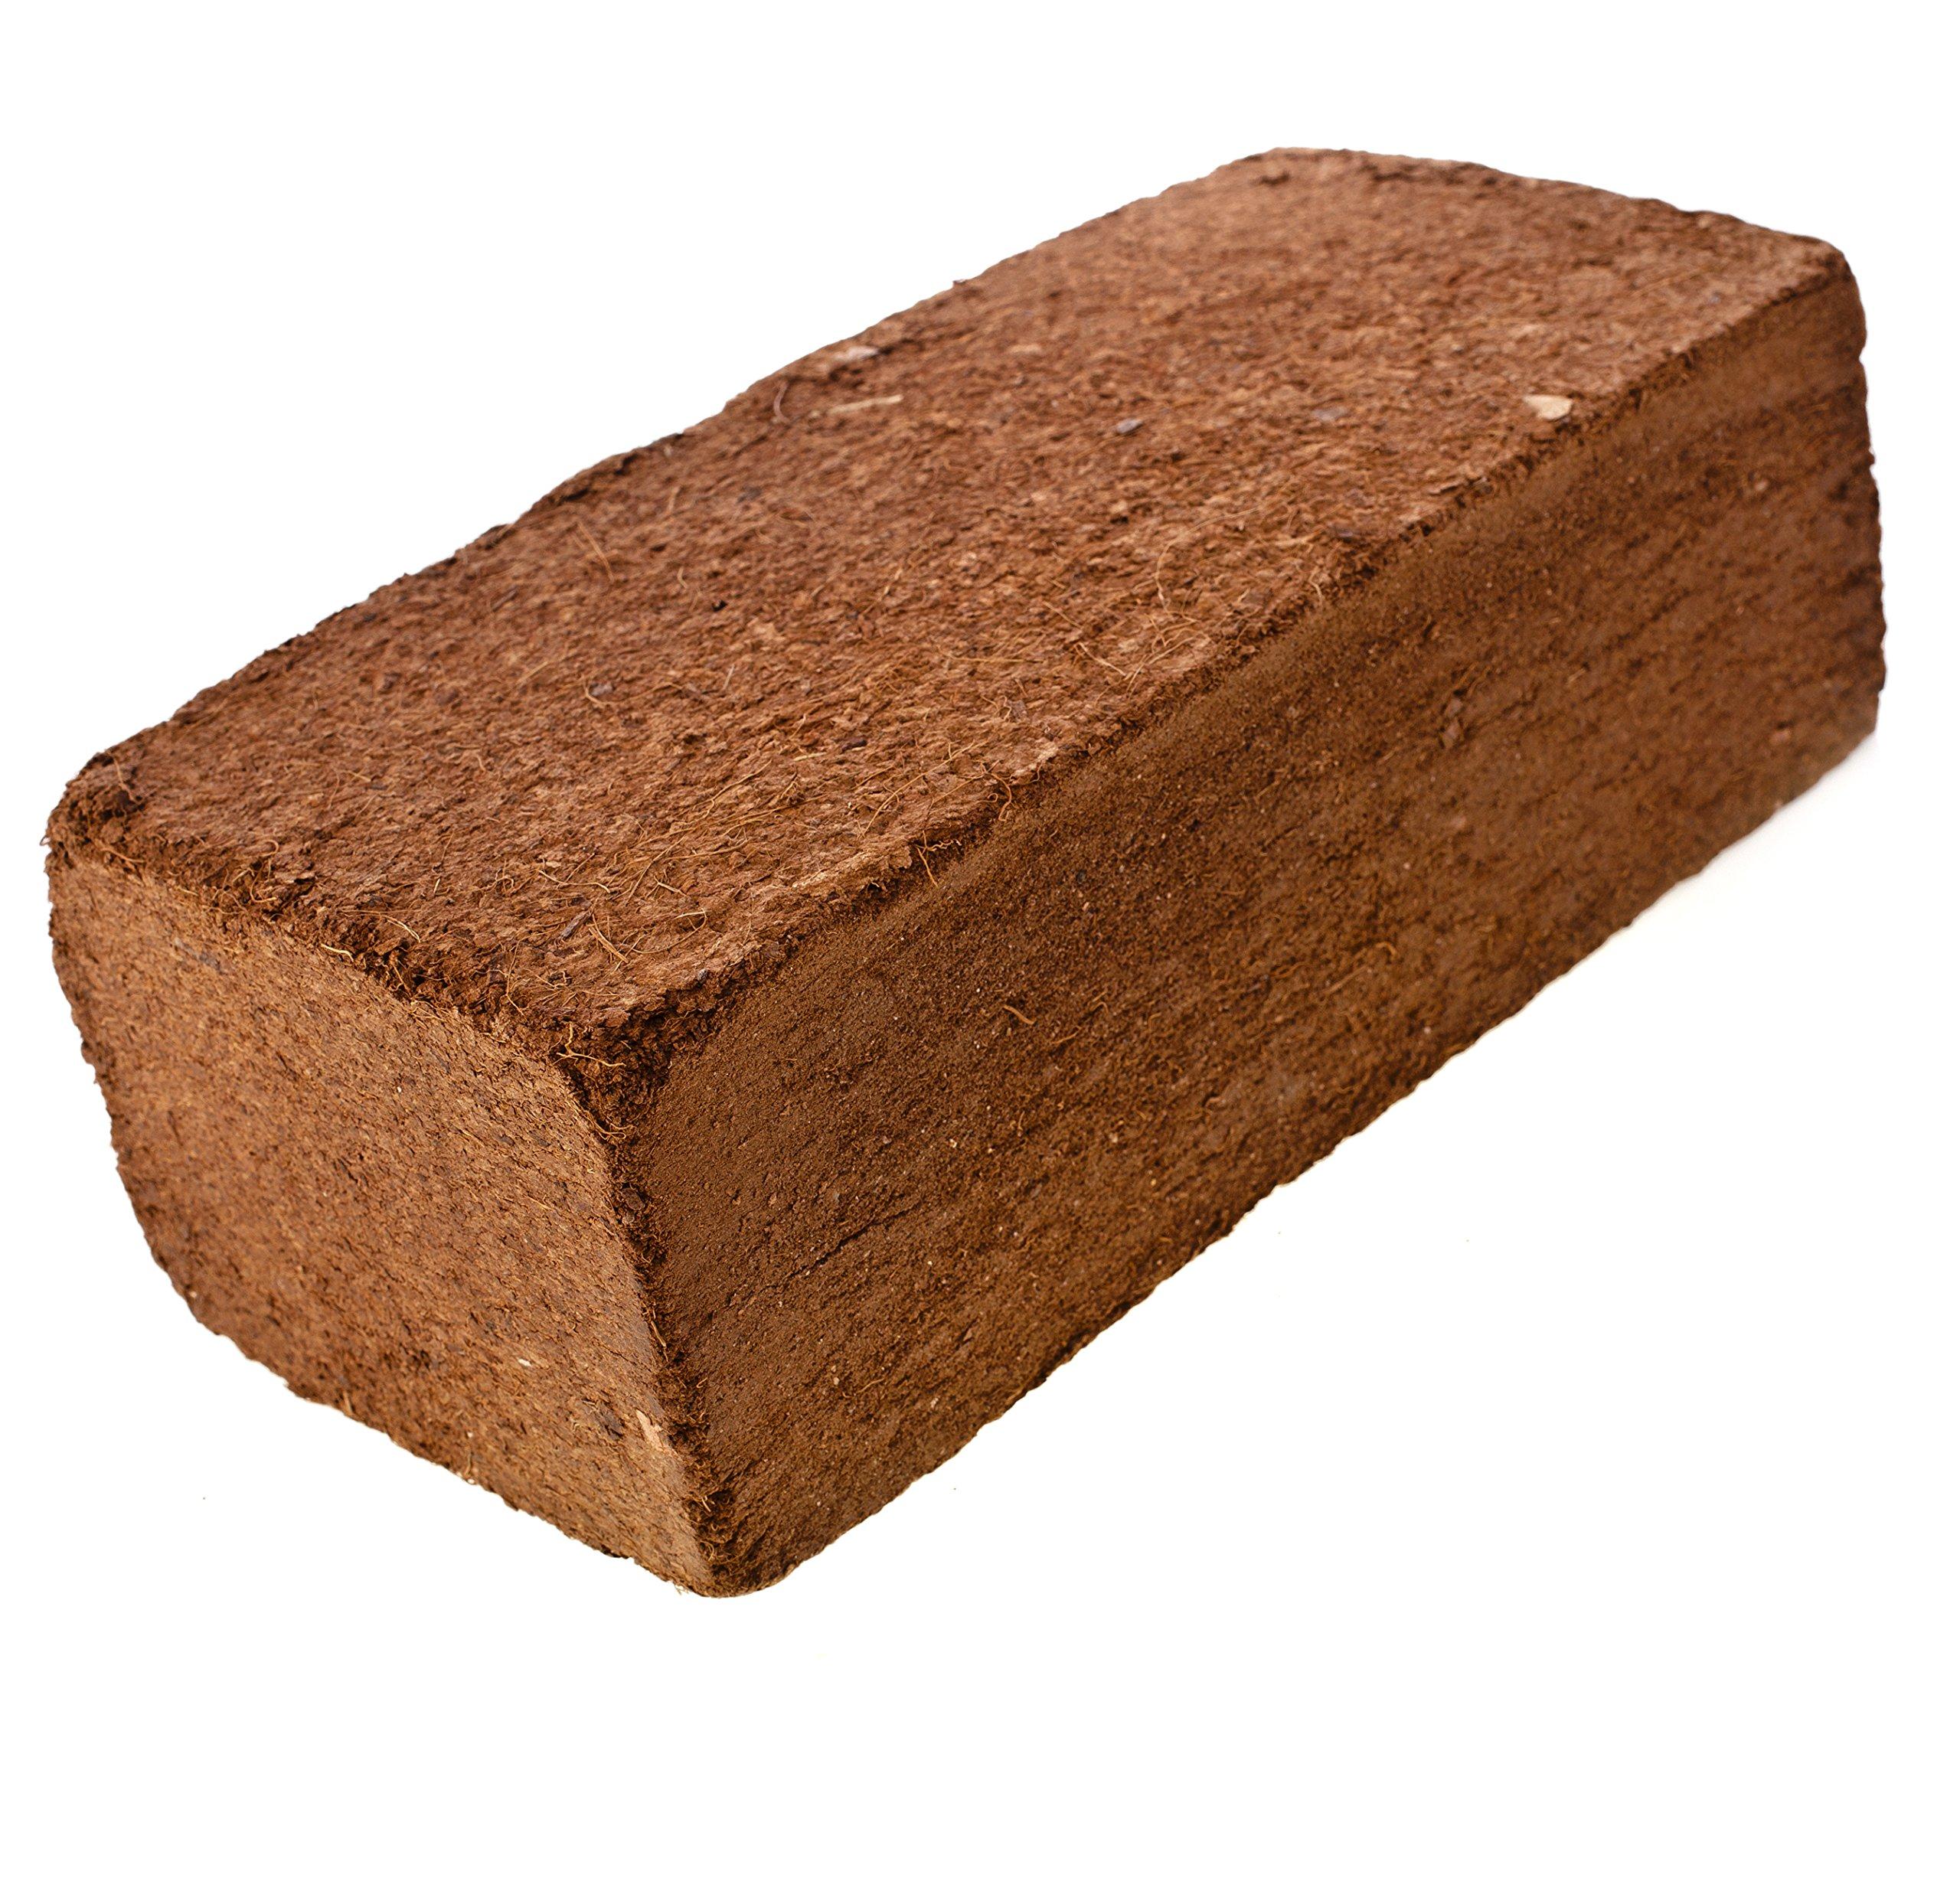 Coco Coir Brick, OMRI listed for Organic Use (50)